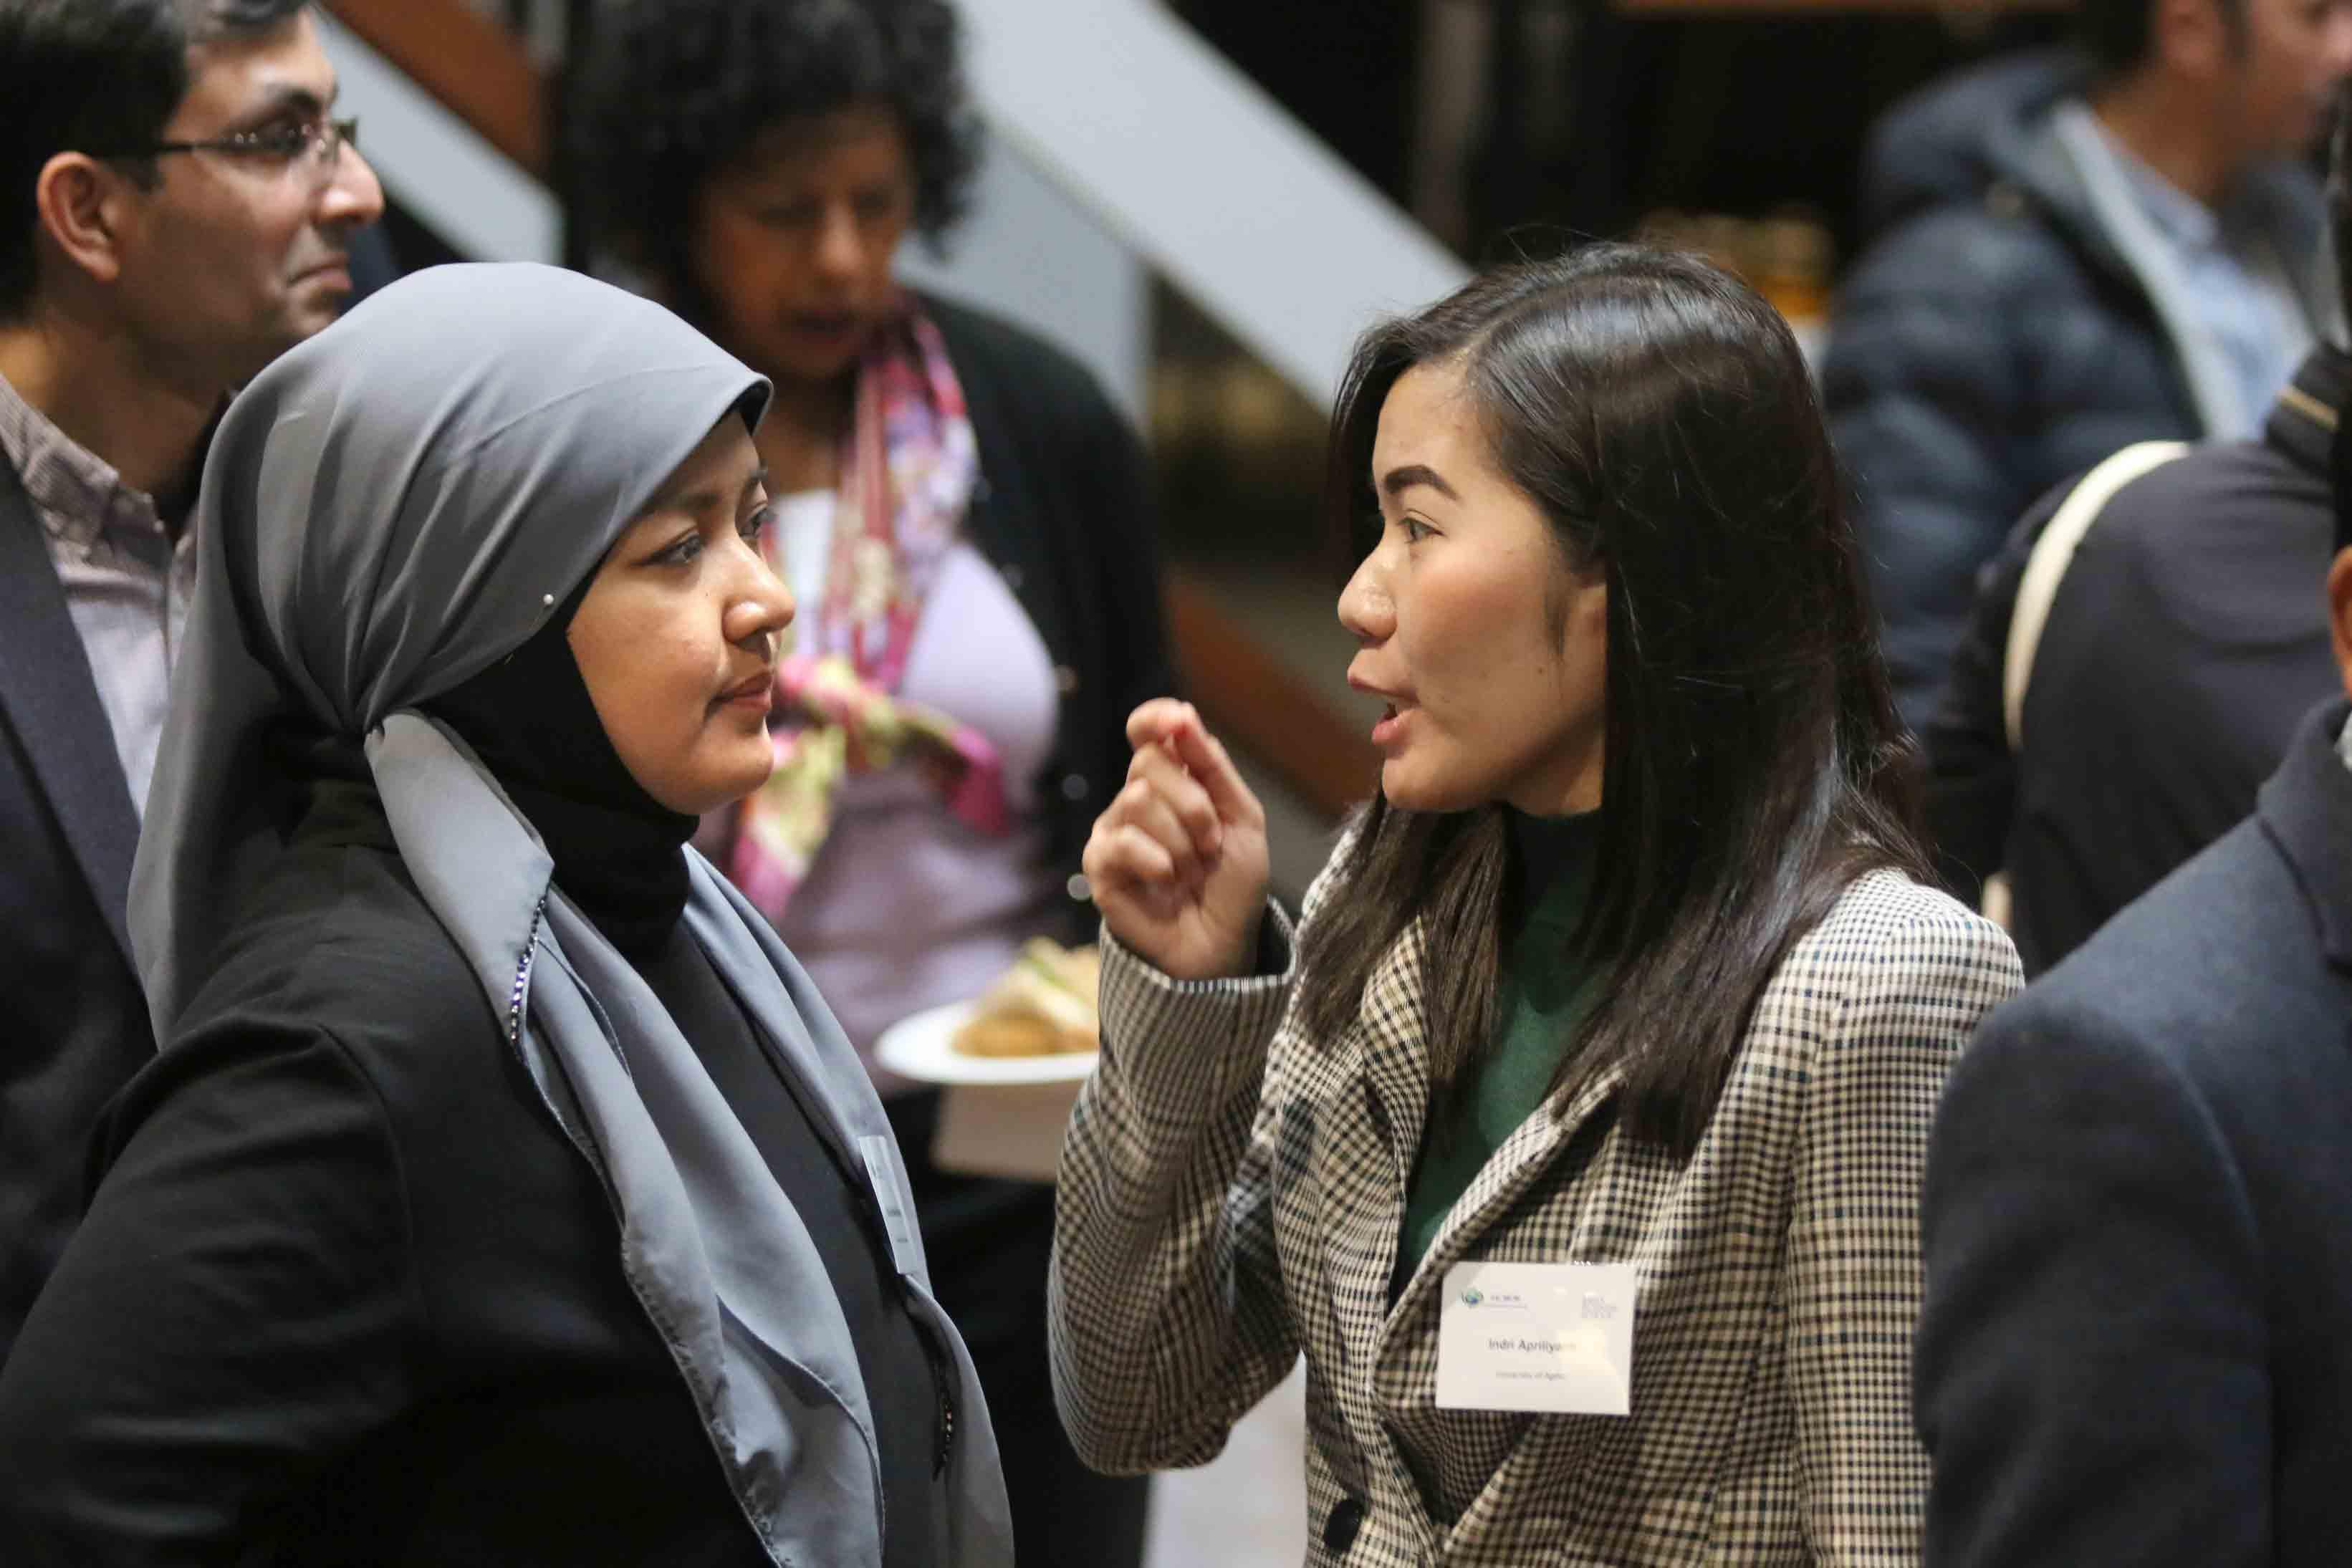 Conference attendee Dian Kartika Rahajeng and Indri Apriliyanti